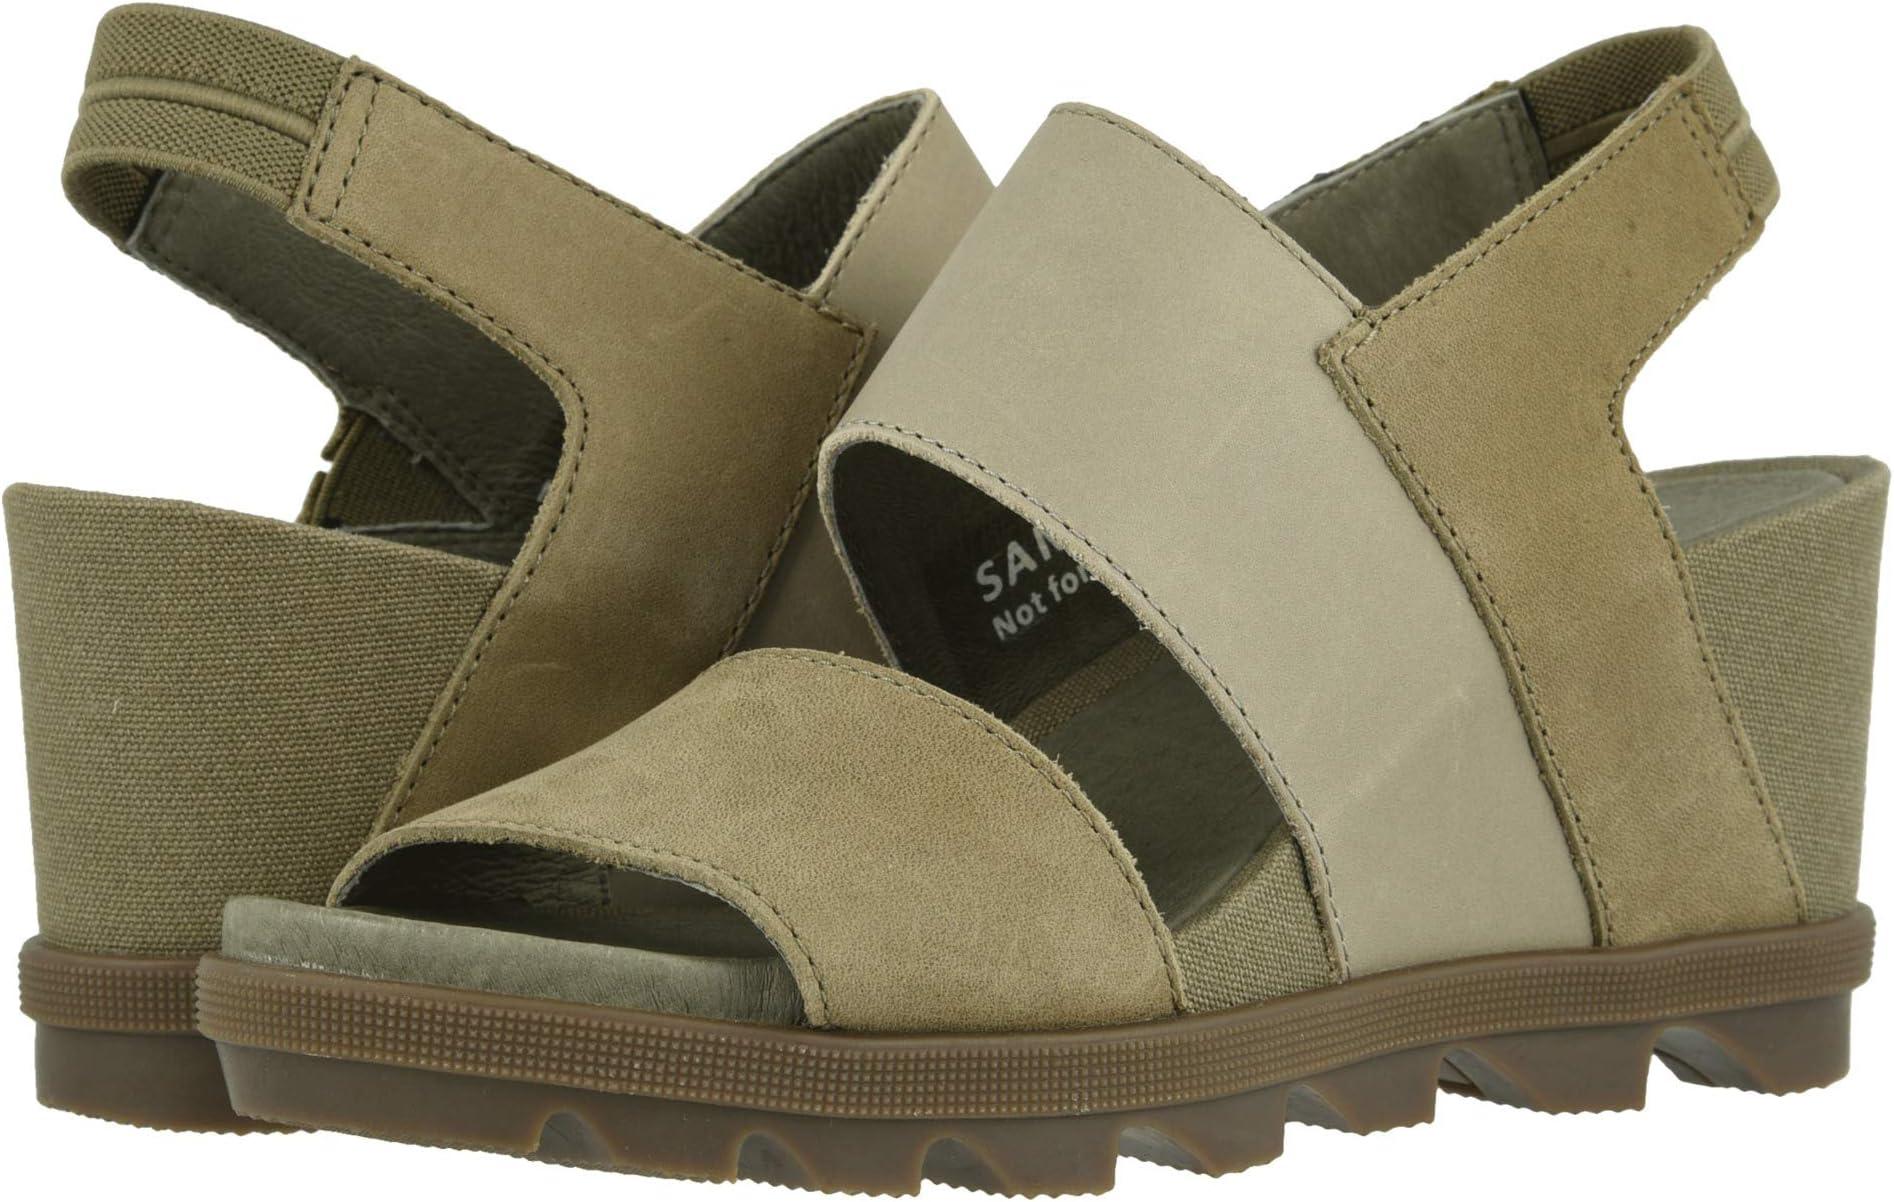 Sorel Heeled Sandals